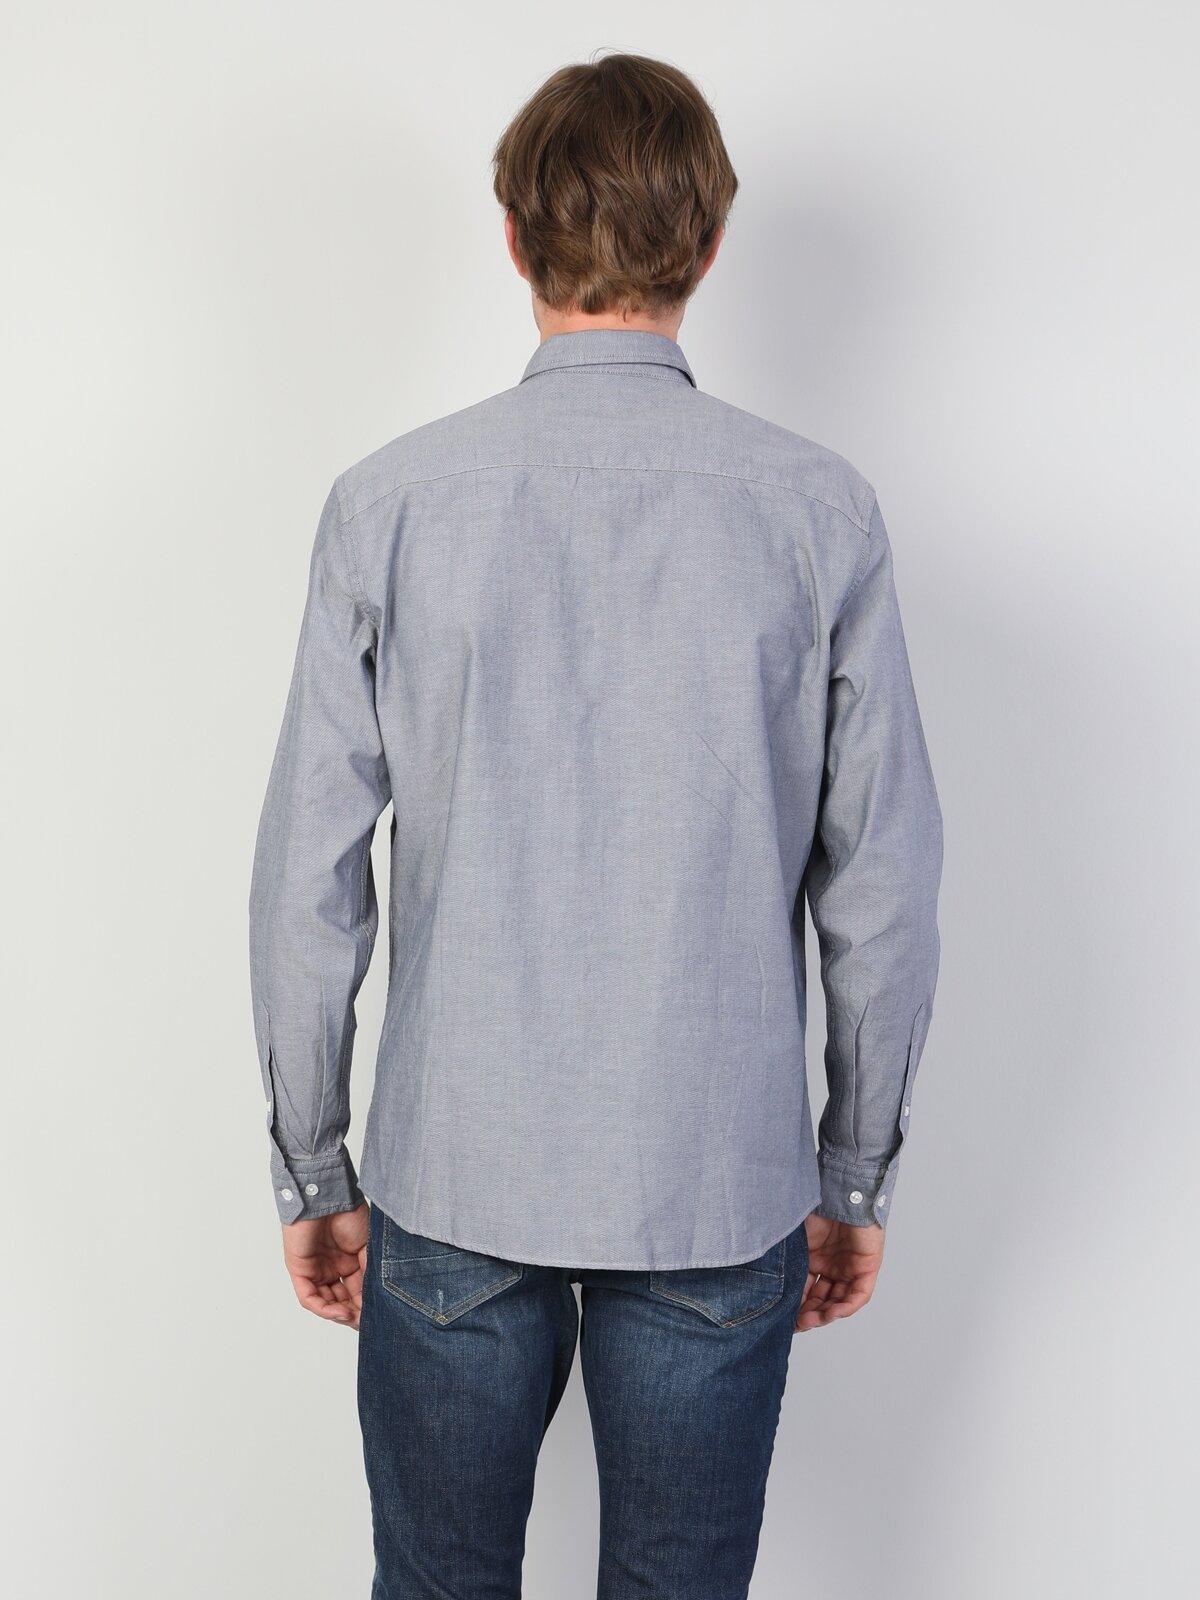 Regular Fit Shirt Neck Erkek Antrasit Uzun Kol Gömlek